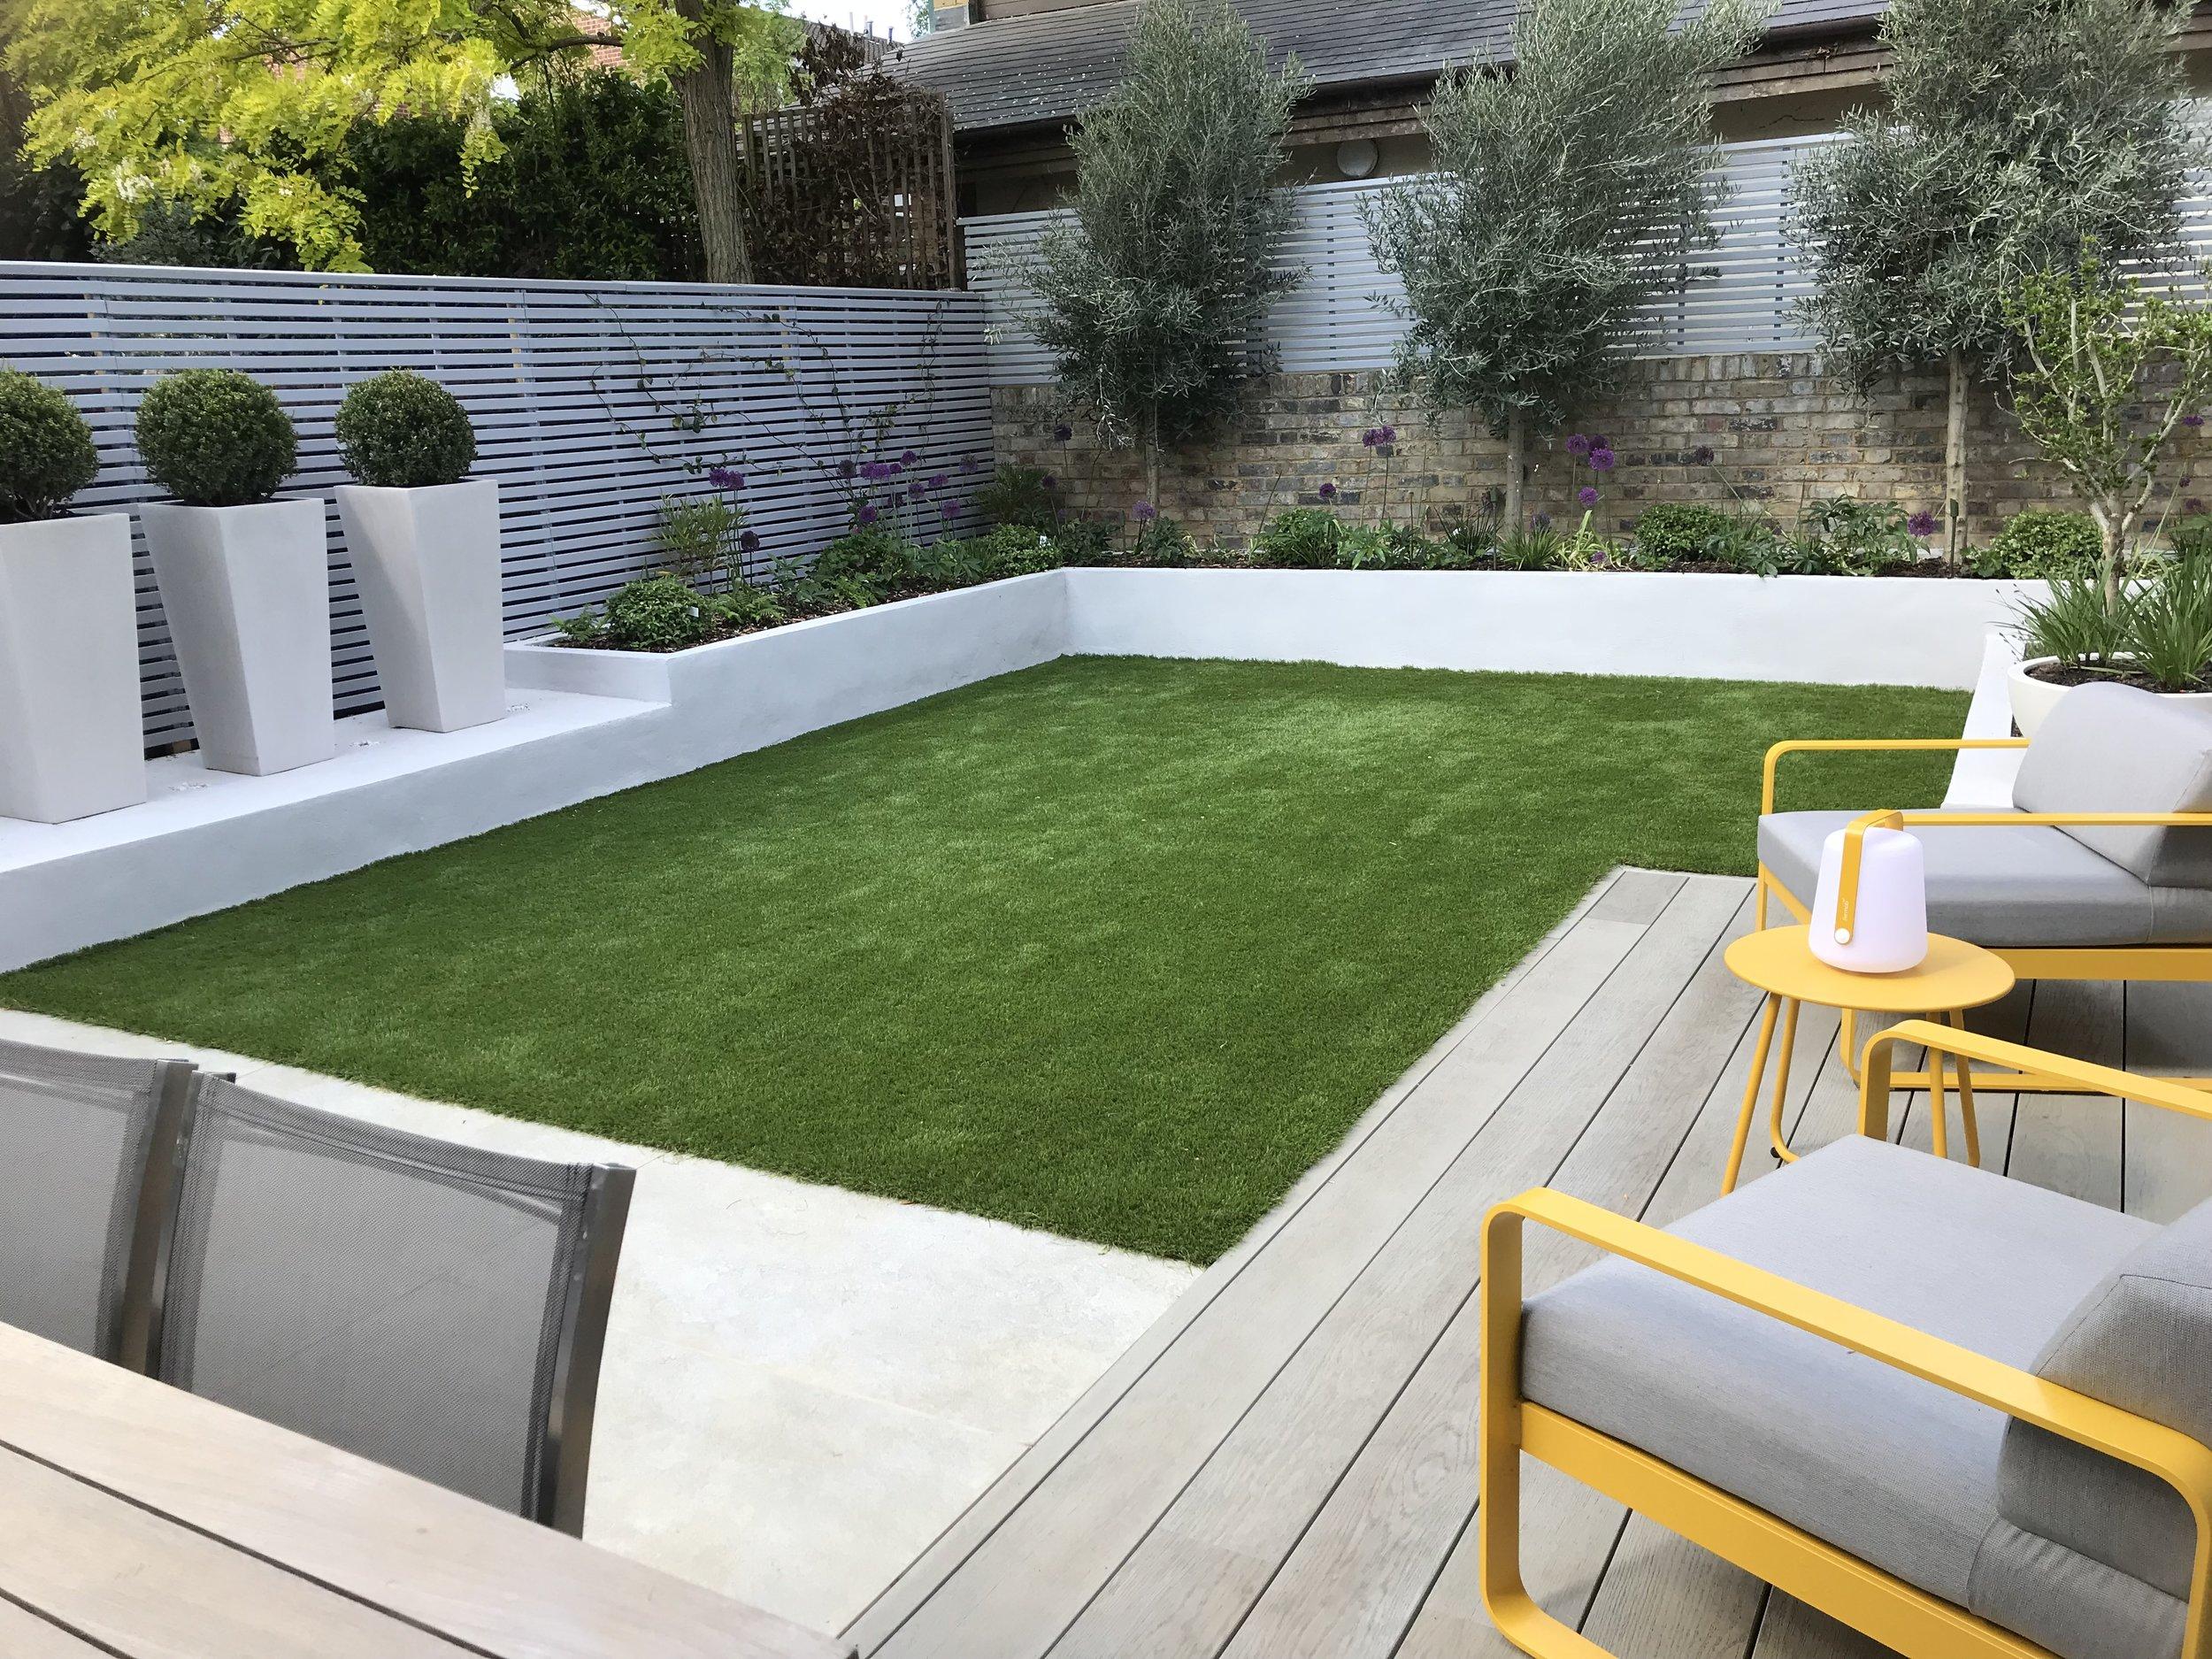 joanna_archer_garden_design_small_family_gardenW4_c.jpg